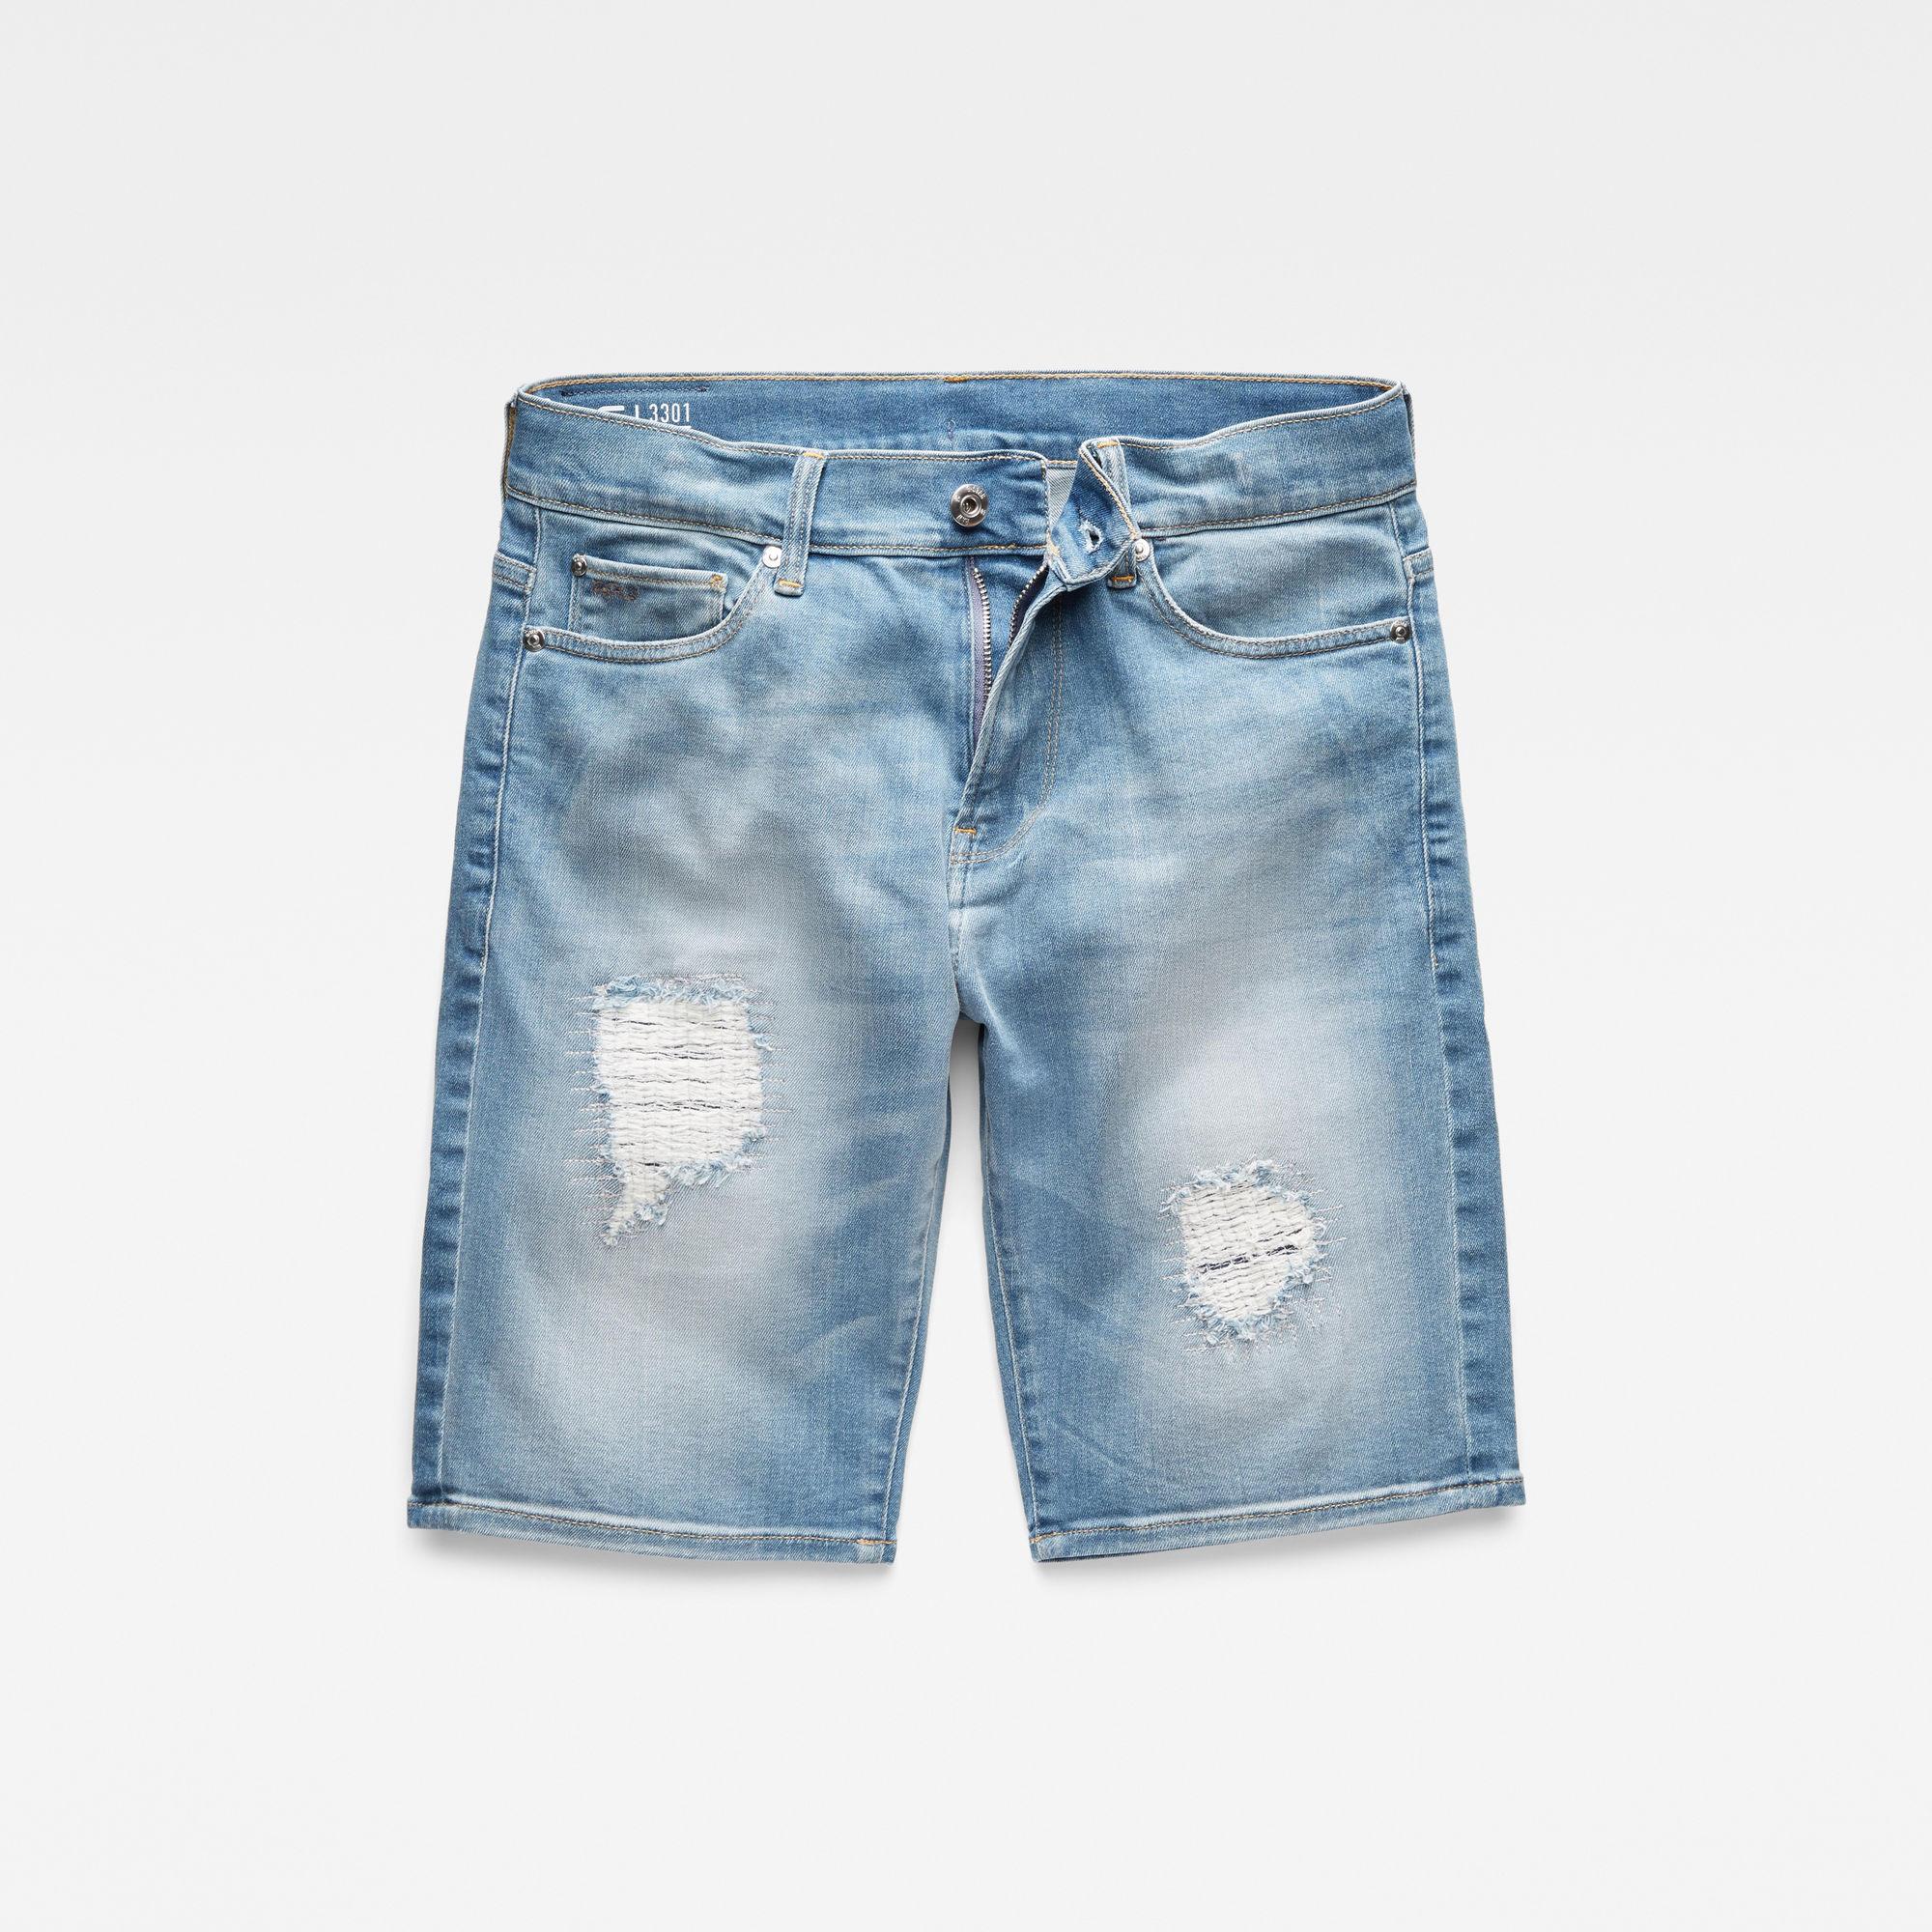 3301 Tapered Short